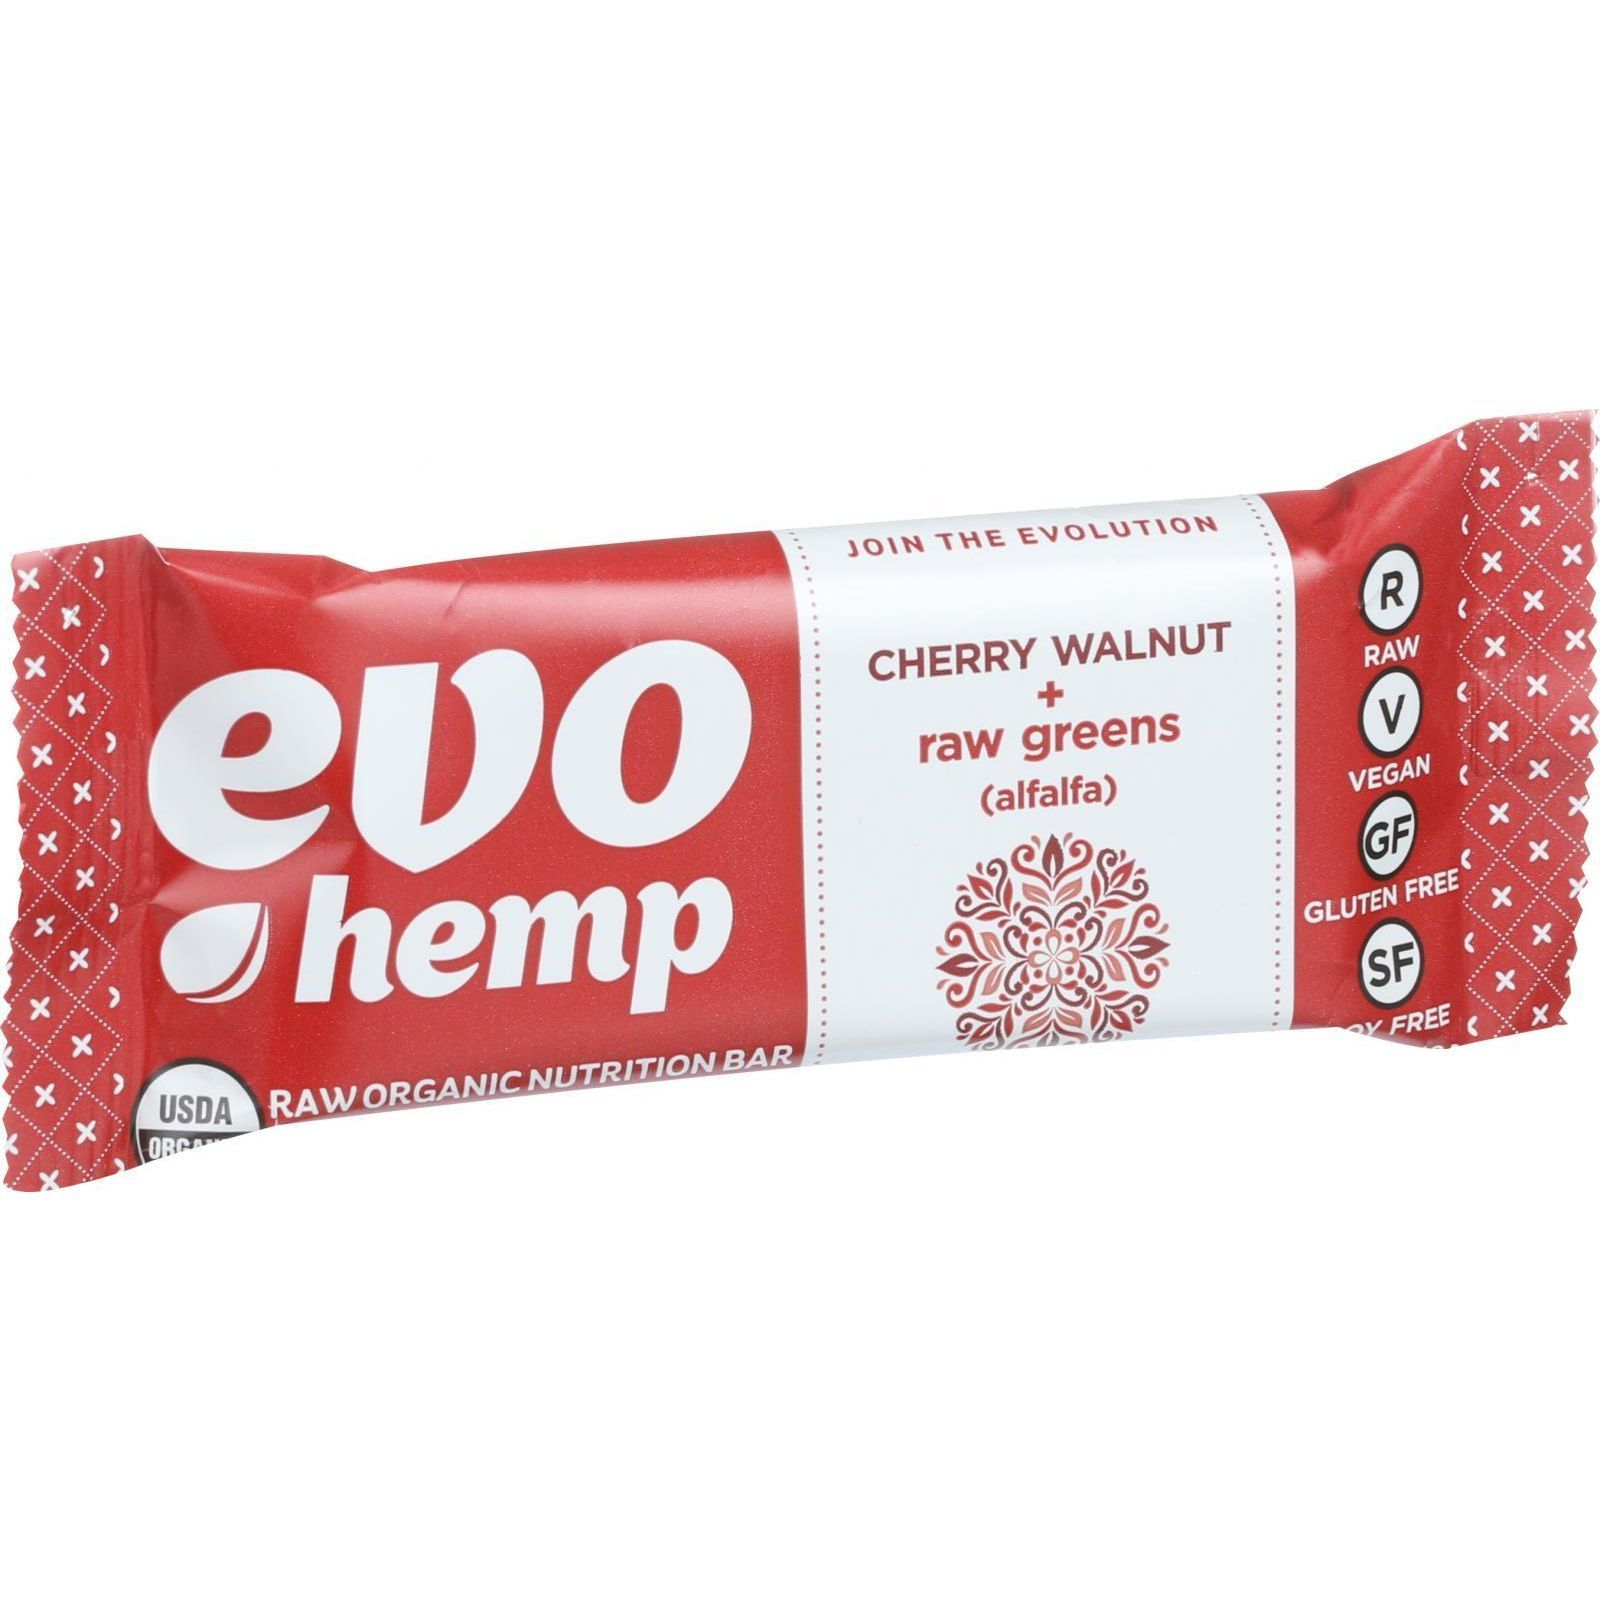 Evo Hemp Organic Hemp Bars - Cherry Walnut Greens - 1.69 oz Bars - Case of 12